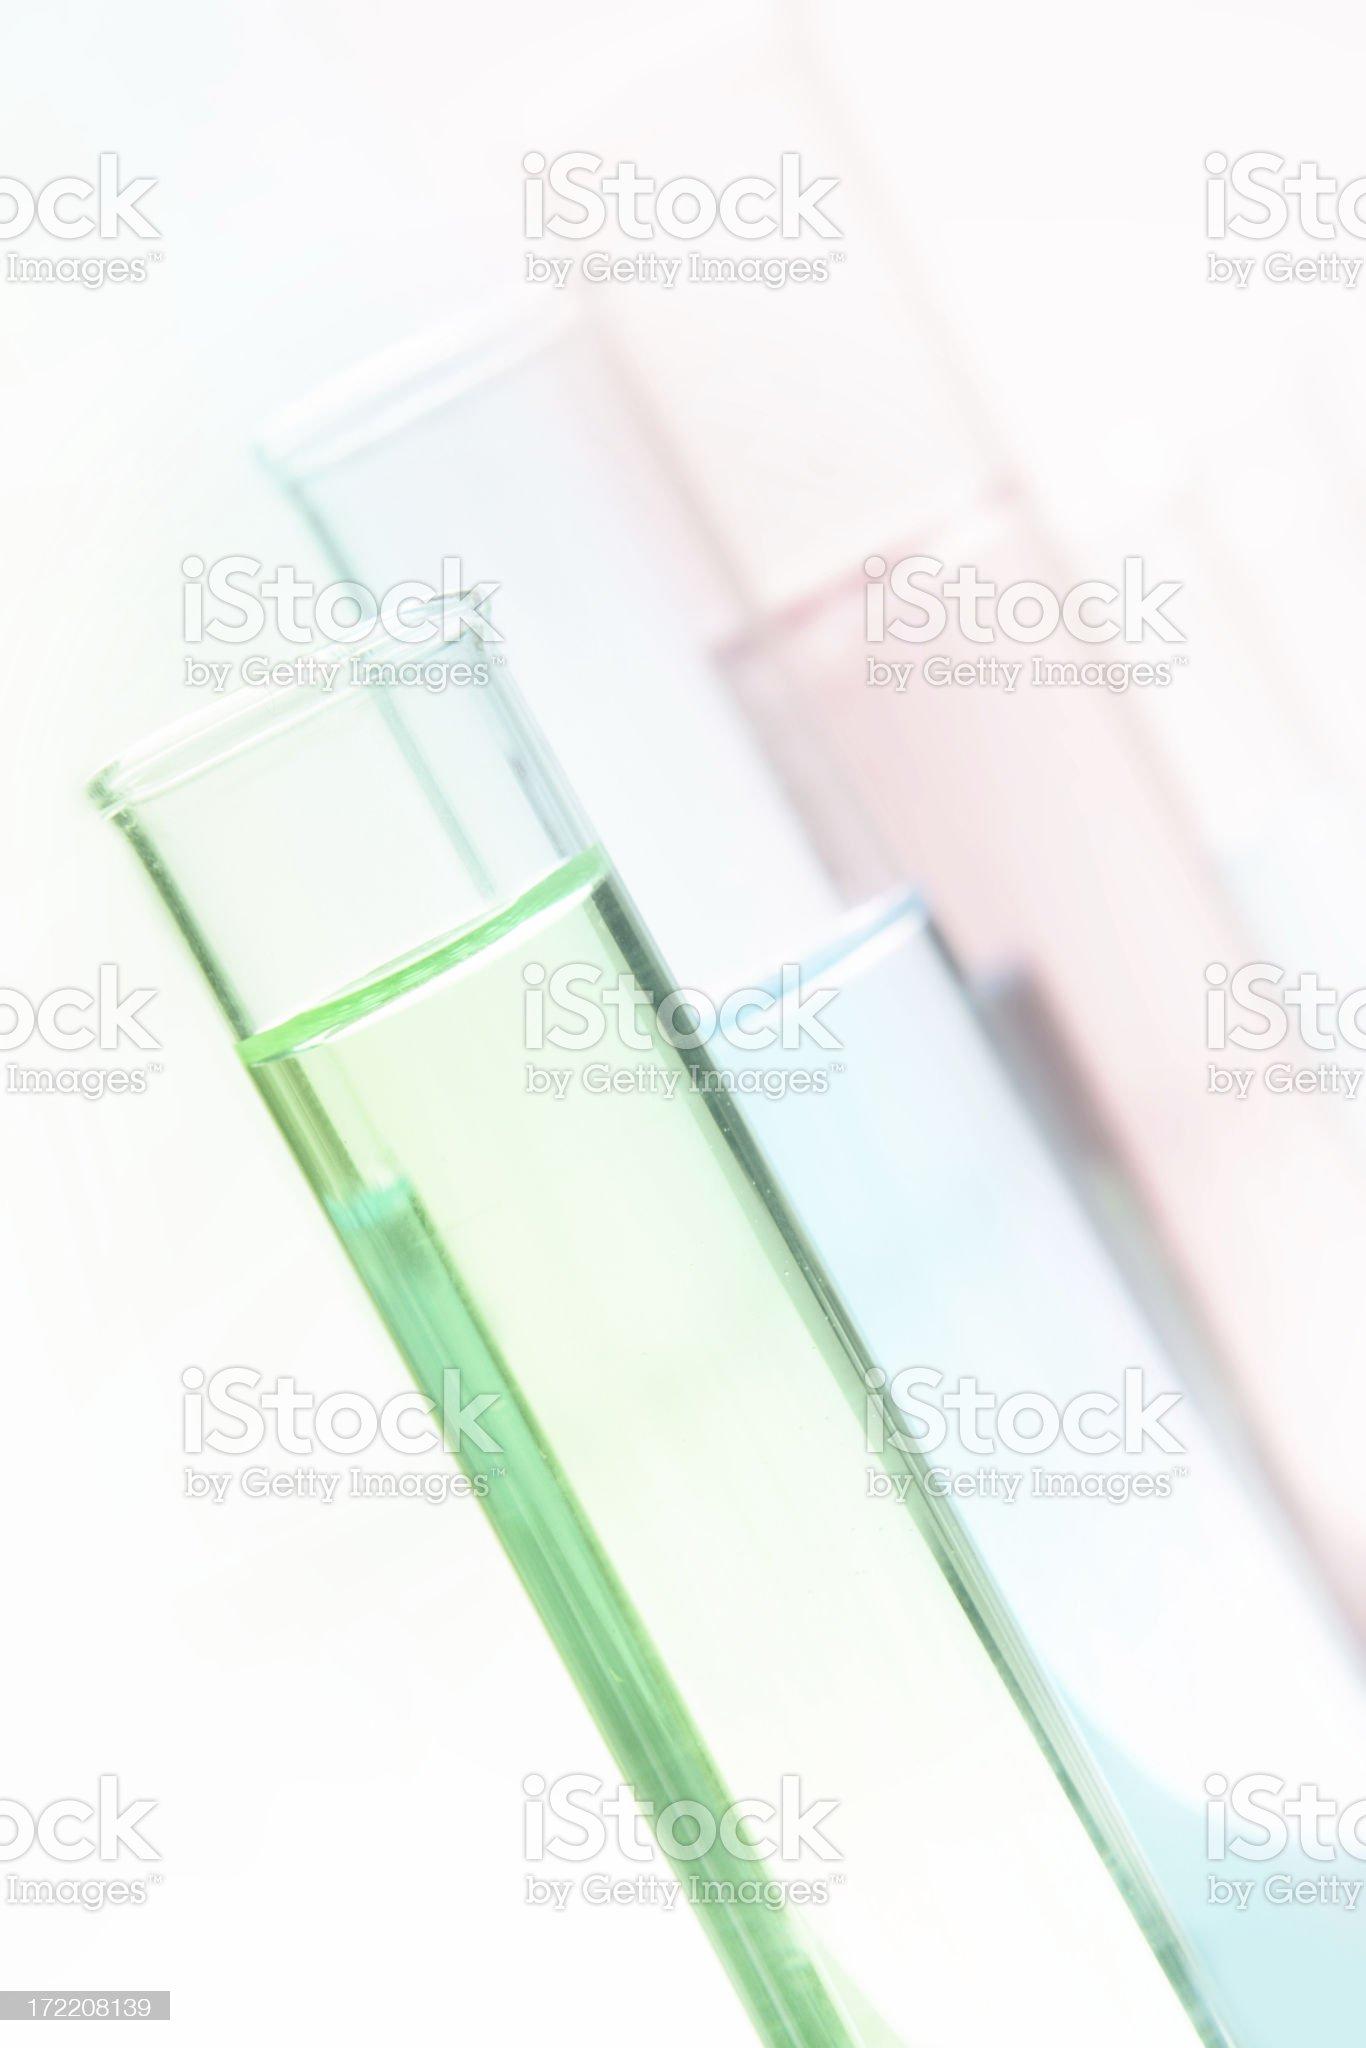 Beautiful Chemistry royalty-free stock photo